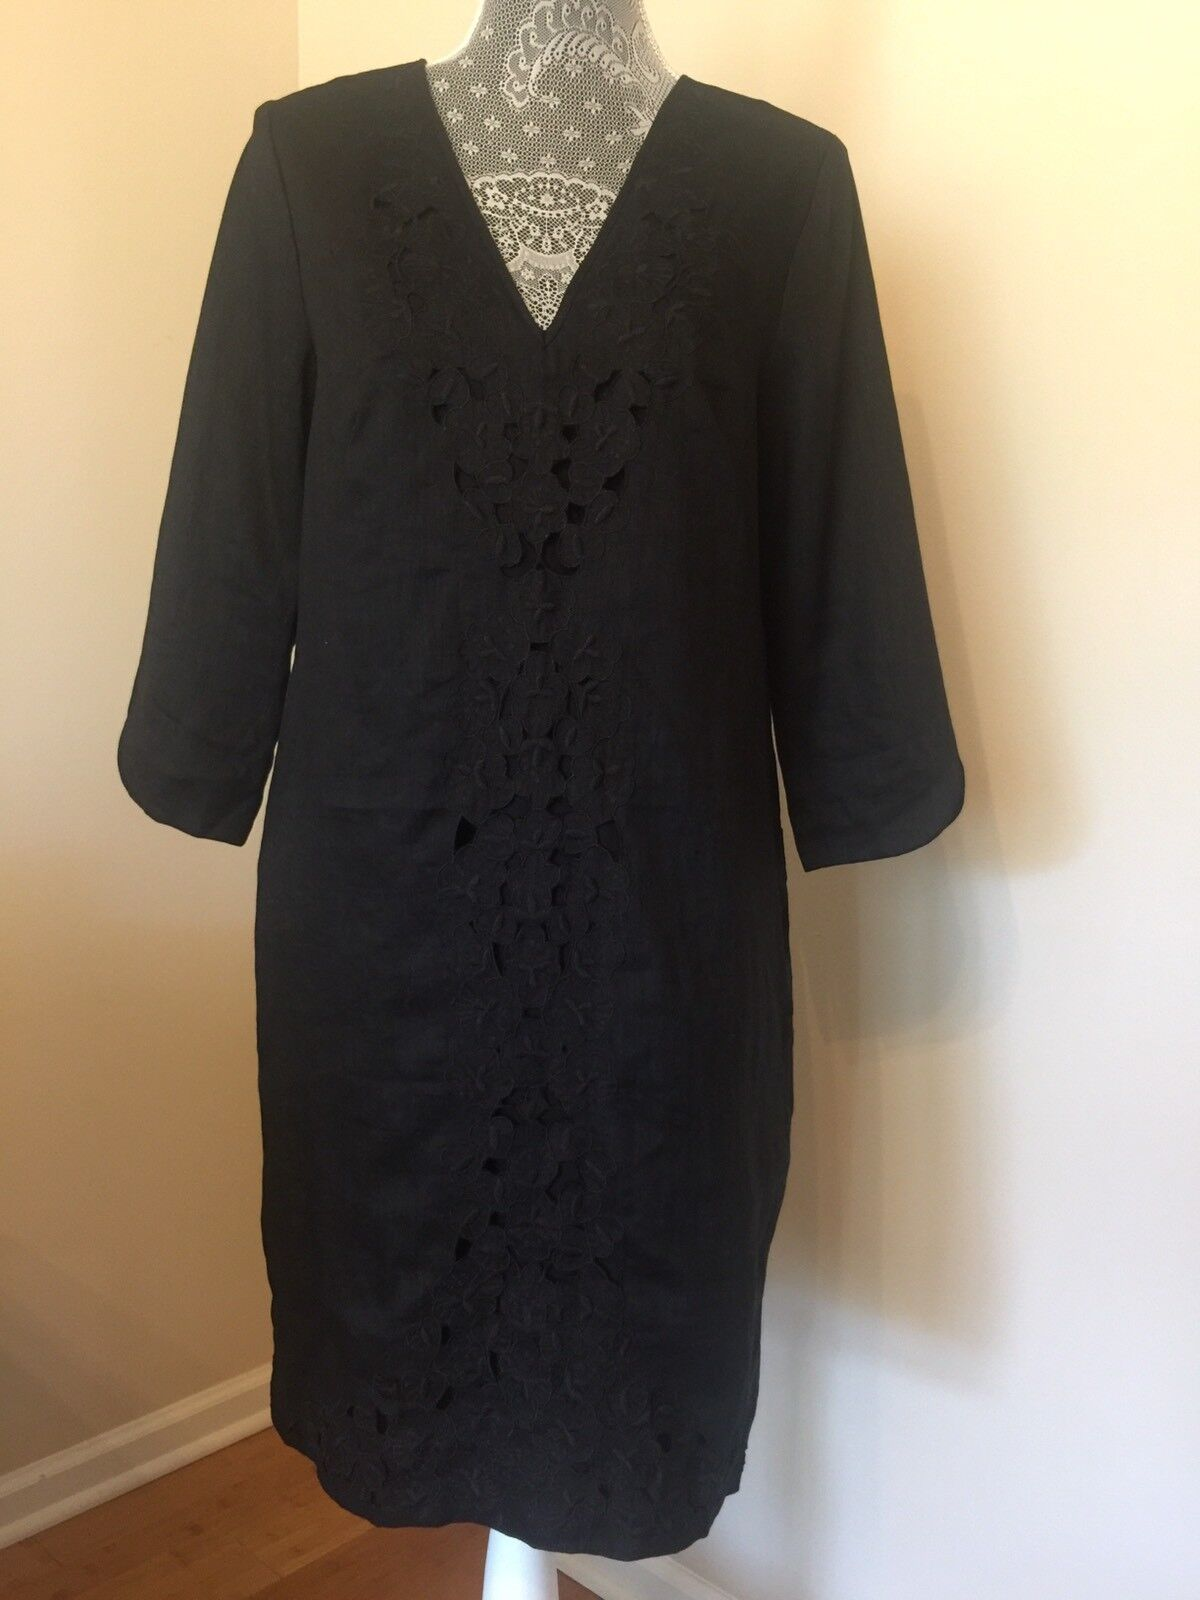 J.CREW Embroiderot Front schwarz Linen Dress V- Neck Sz 6 Work New